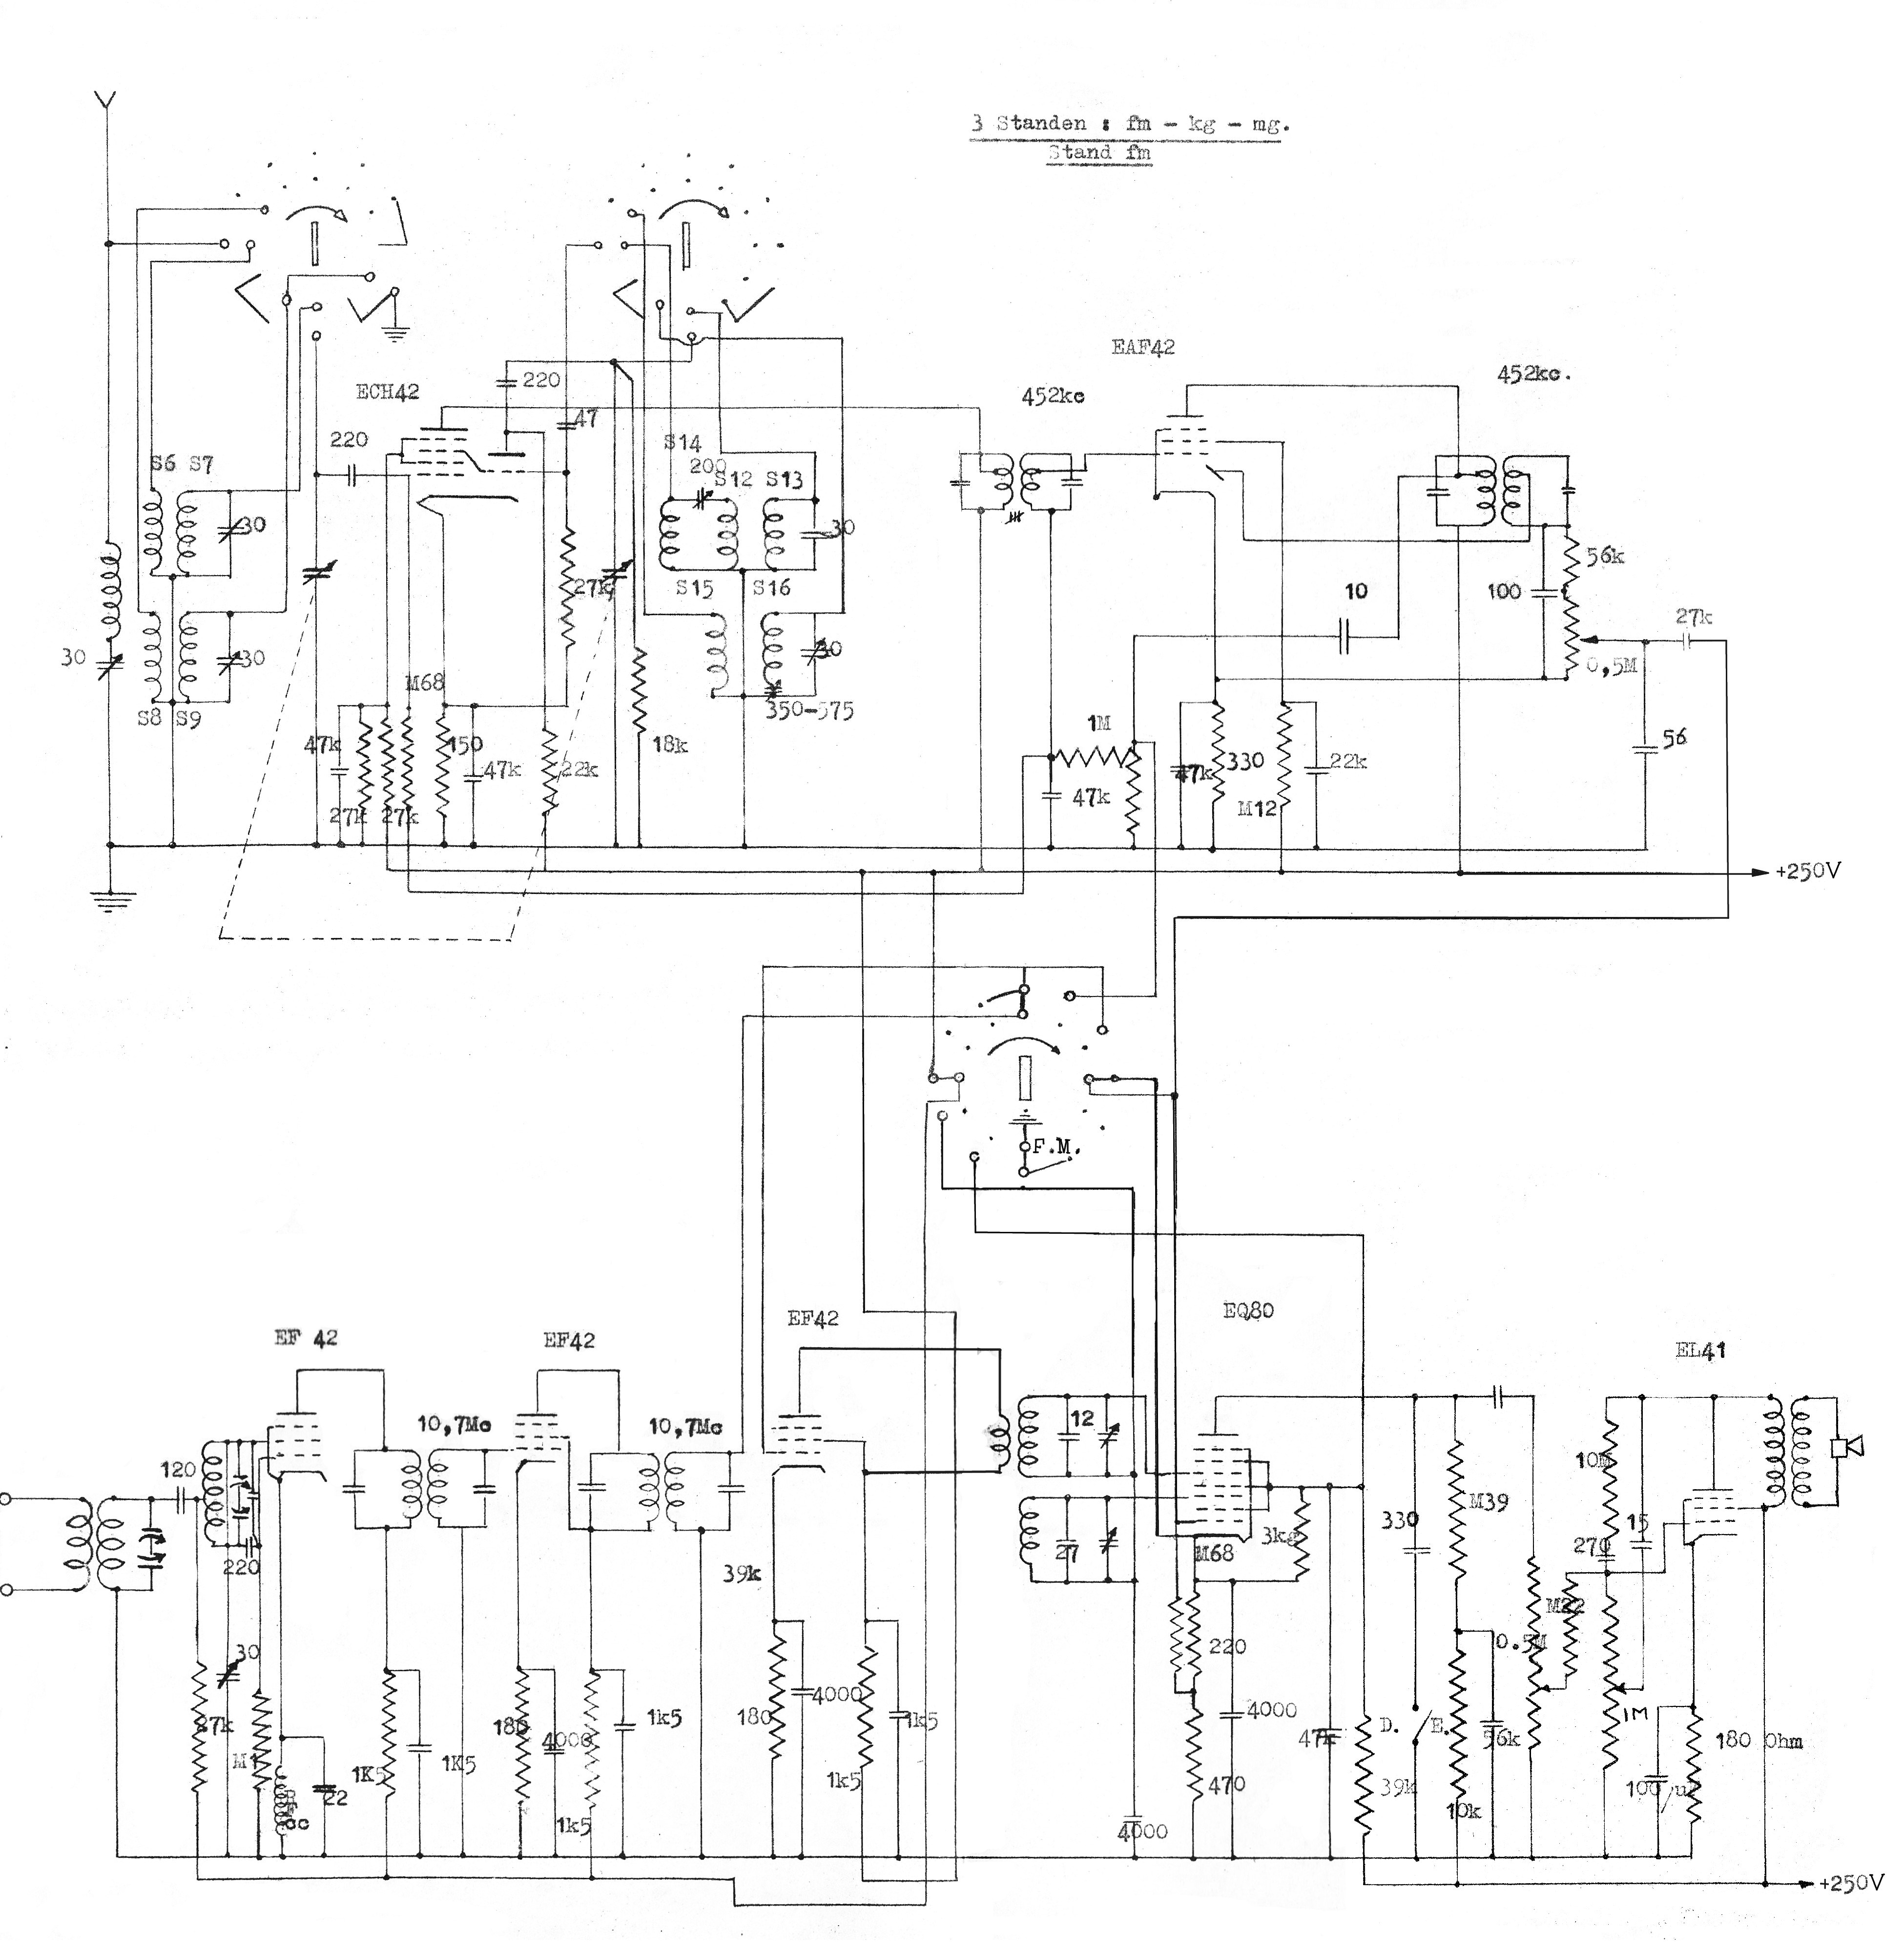 Forest River Mb Wiring Diagram - G2 wiring diagram3.emd.institut-triskell-de-diamant.fr